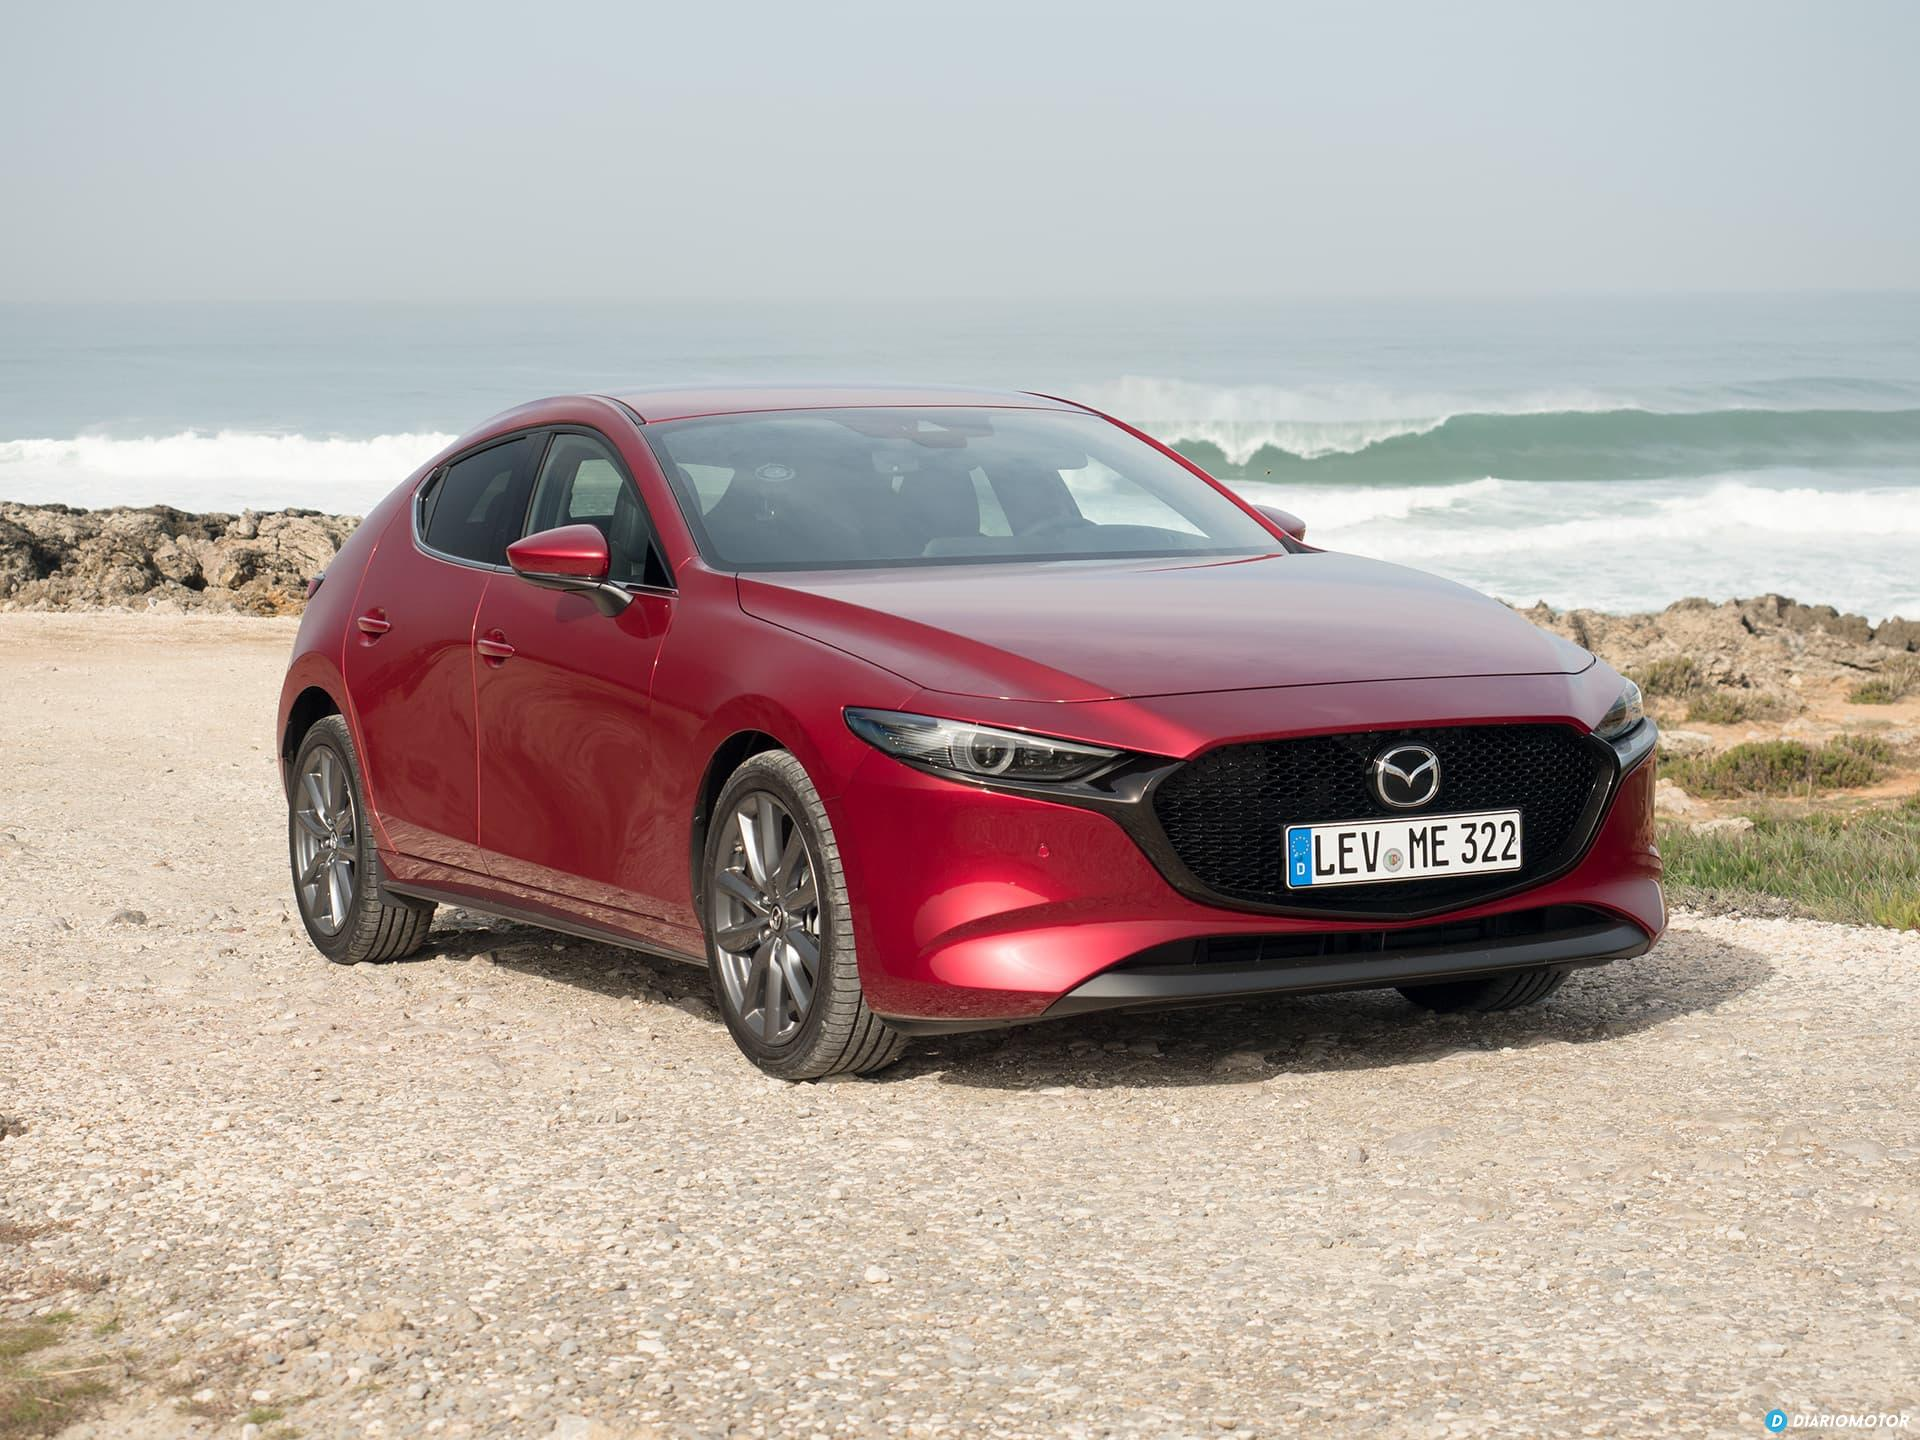 Mazda 3 Skyactiv G  Exterior 00011